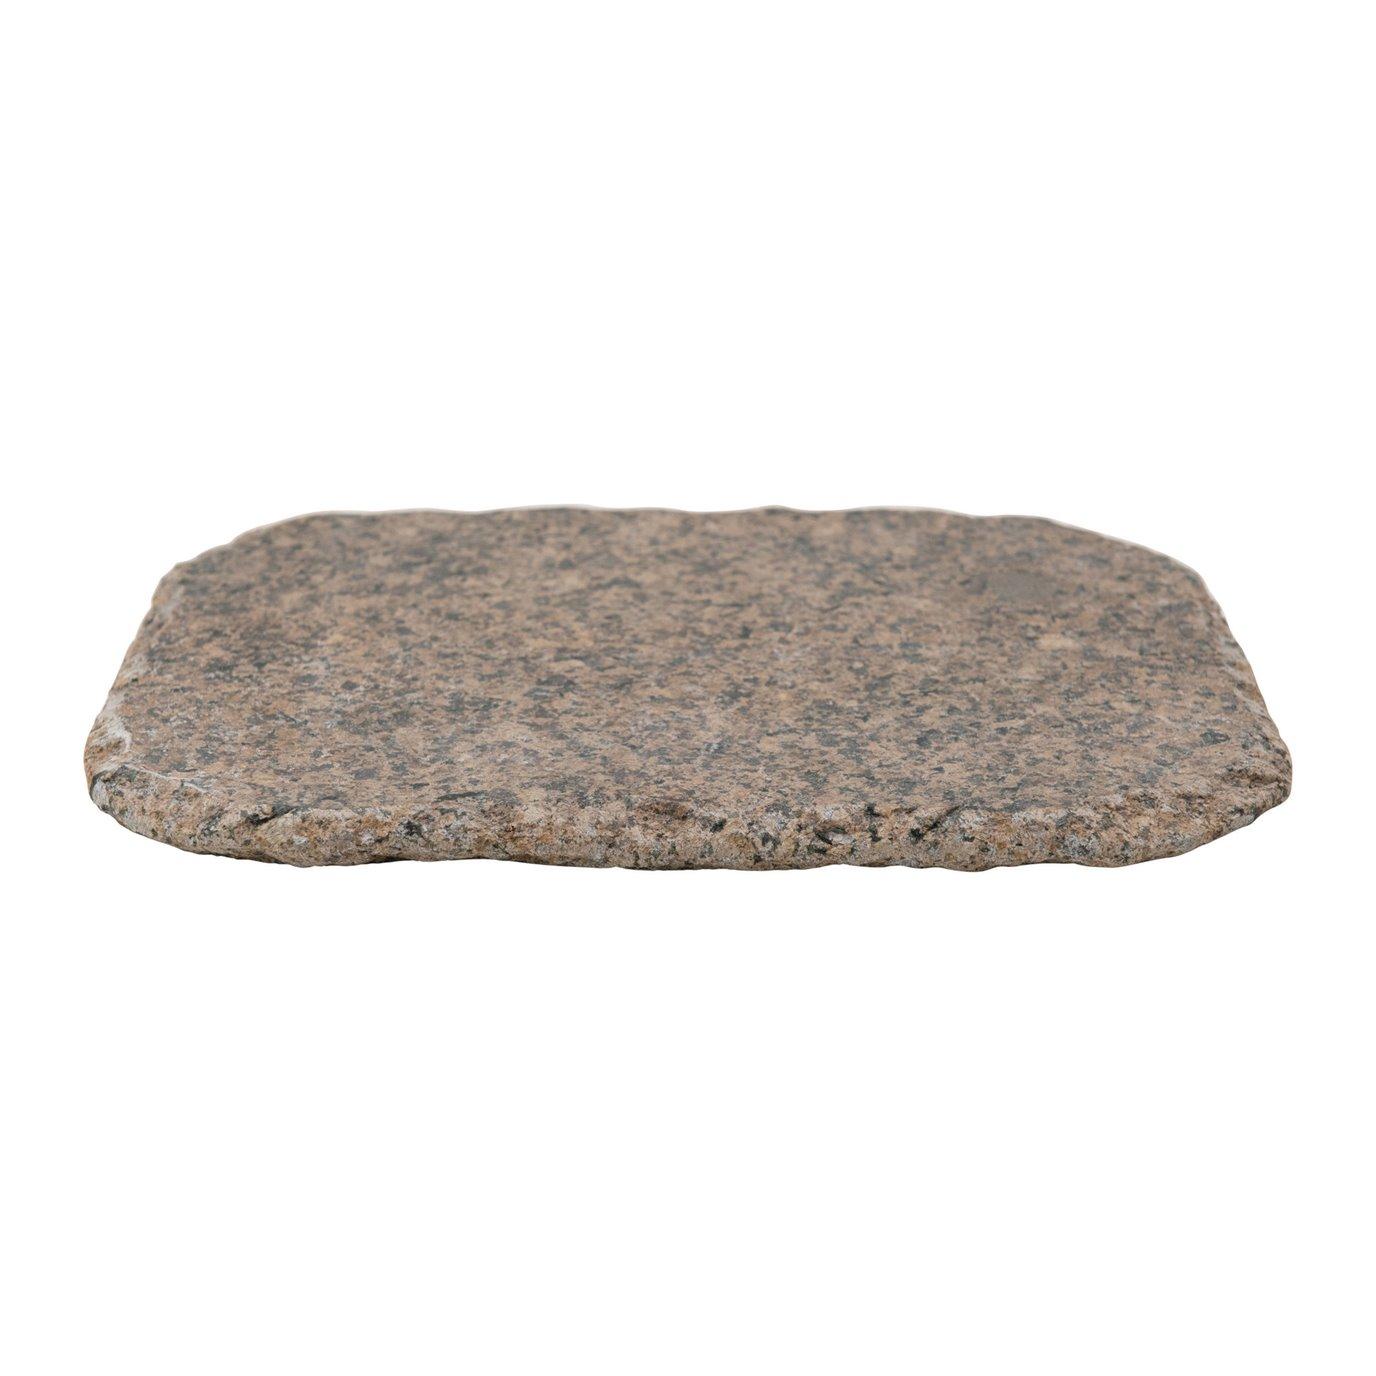 Granite Cheese/Cutting Board